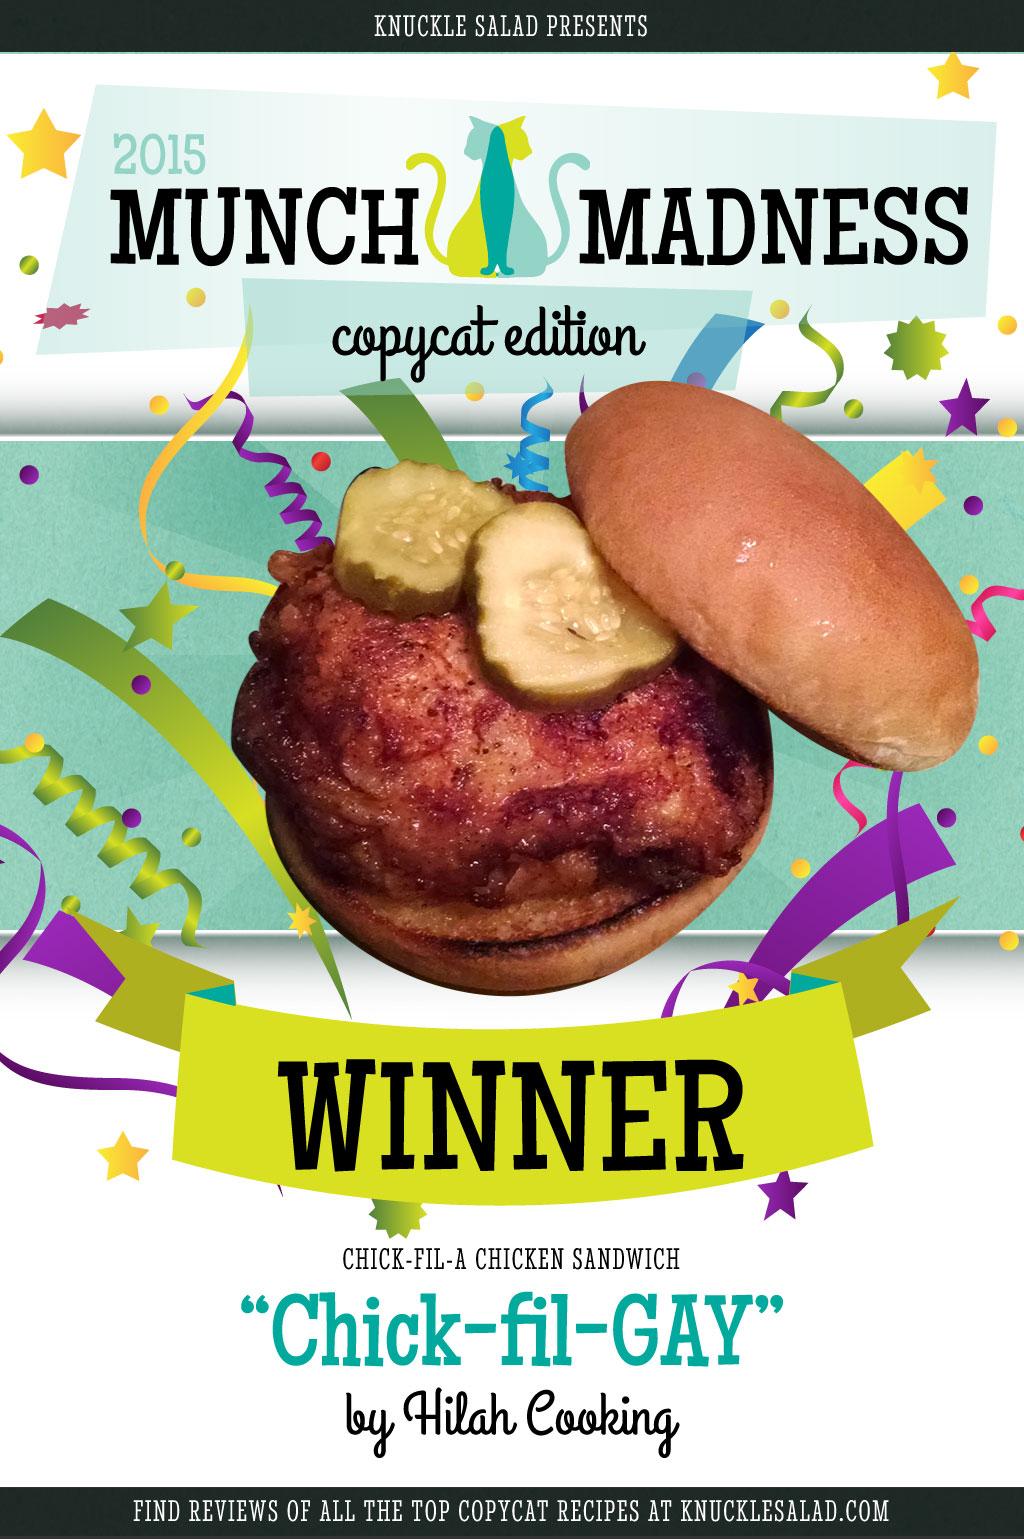 Munch Madness 2015 Winner: The Chick-fil-GAY